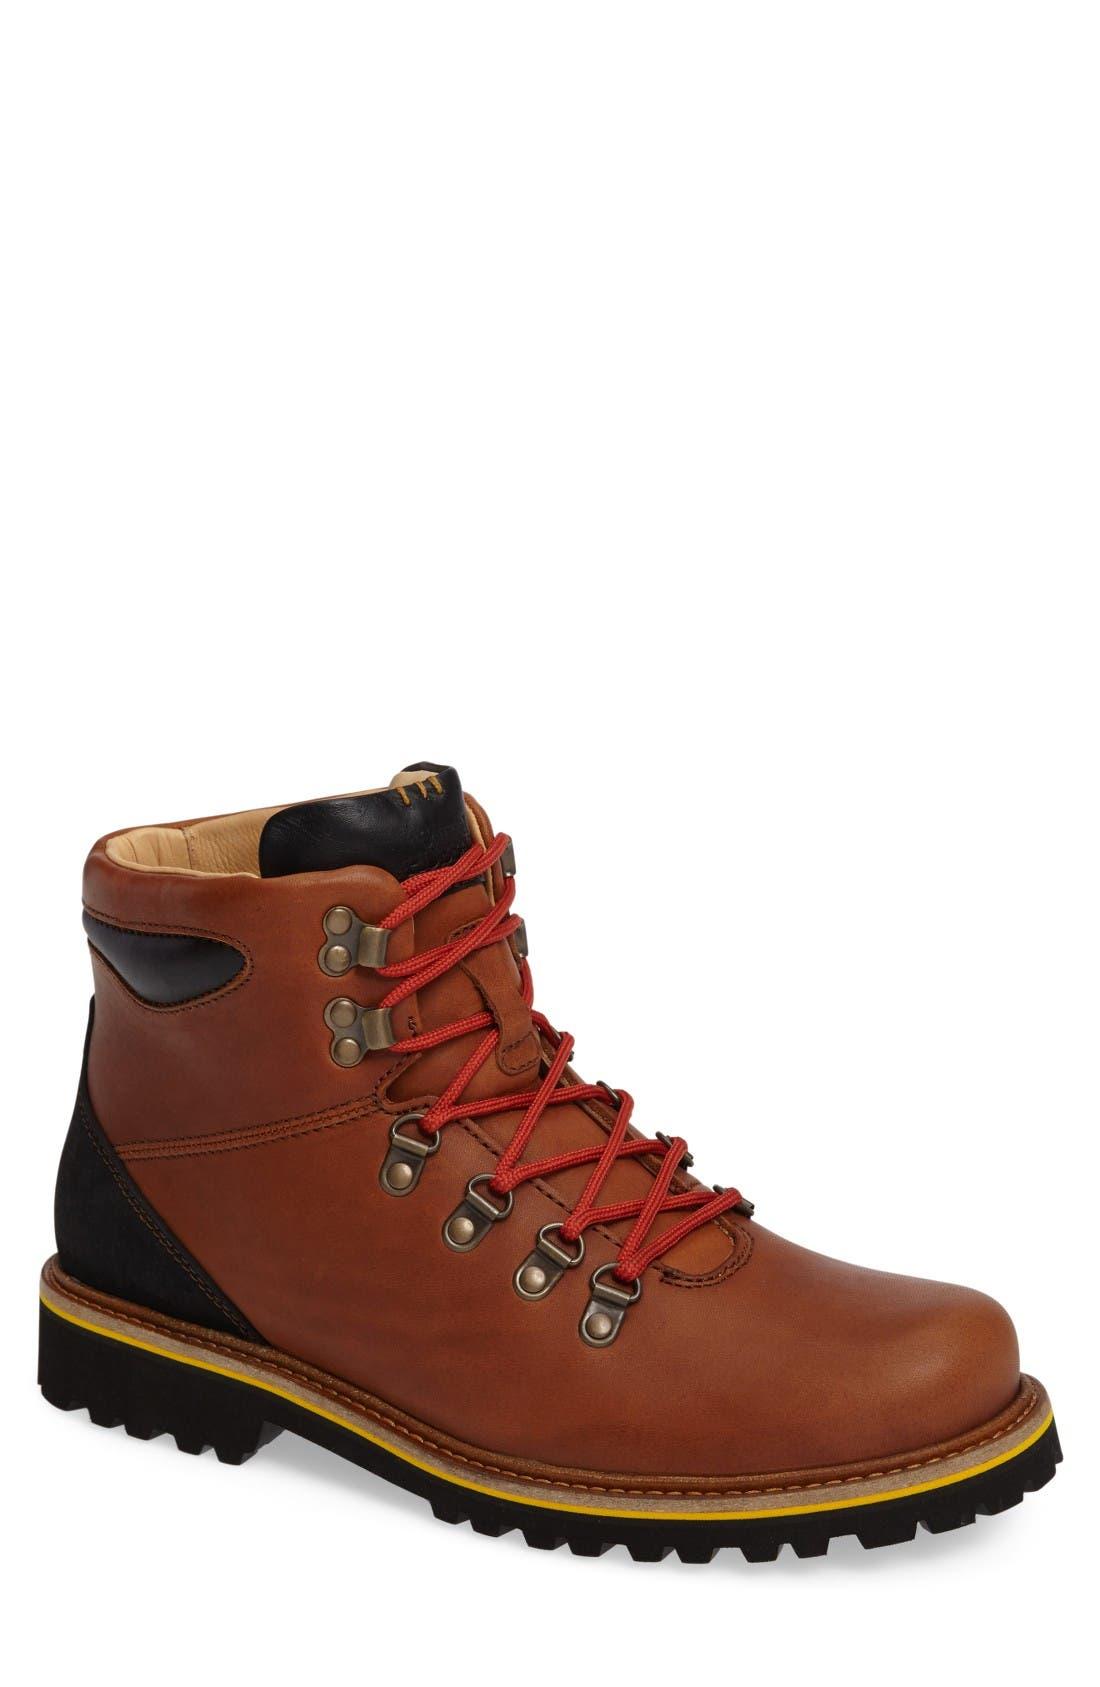 Main Image - Samuel Hubbard Mt. Tam Hiking Boot (Men)